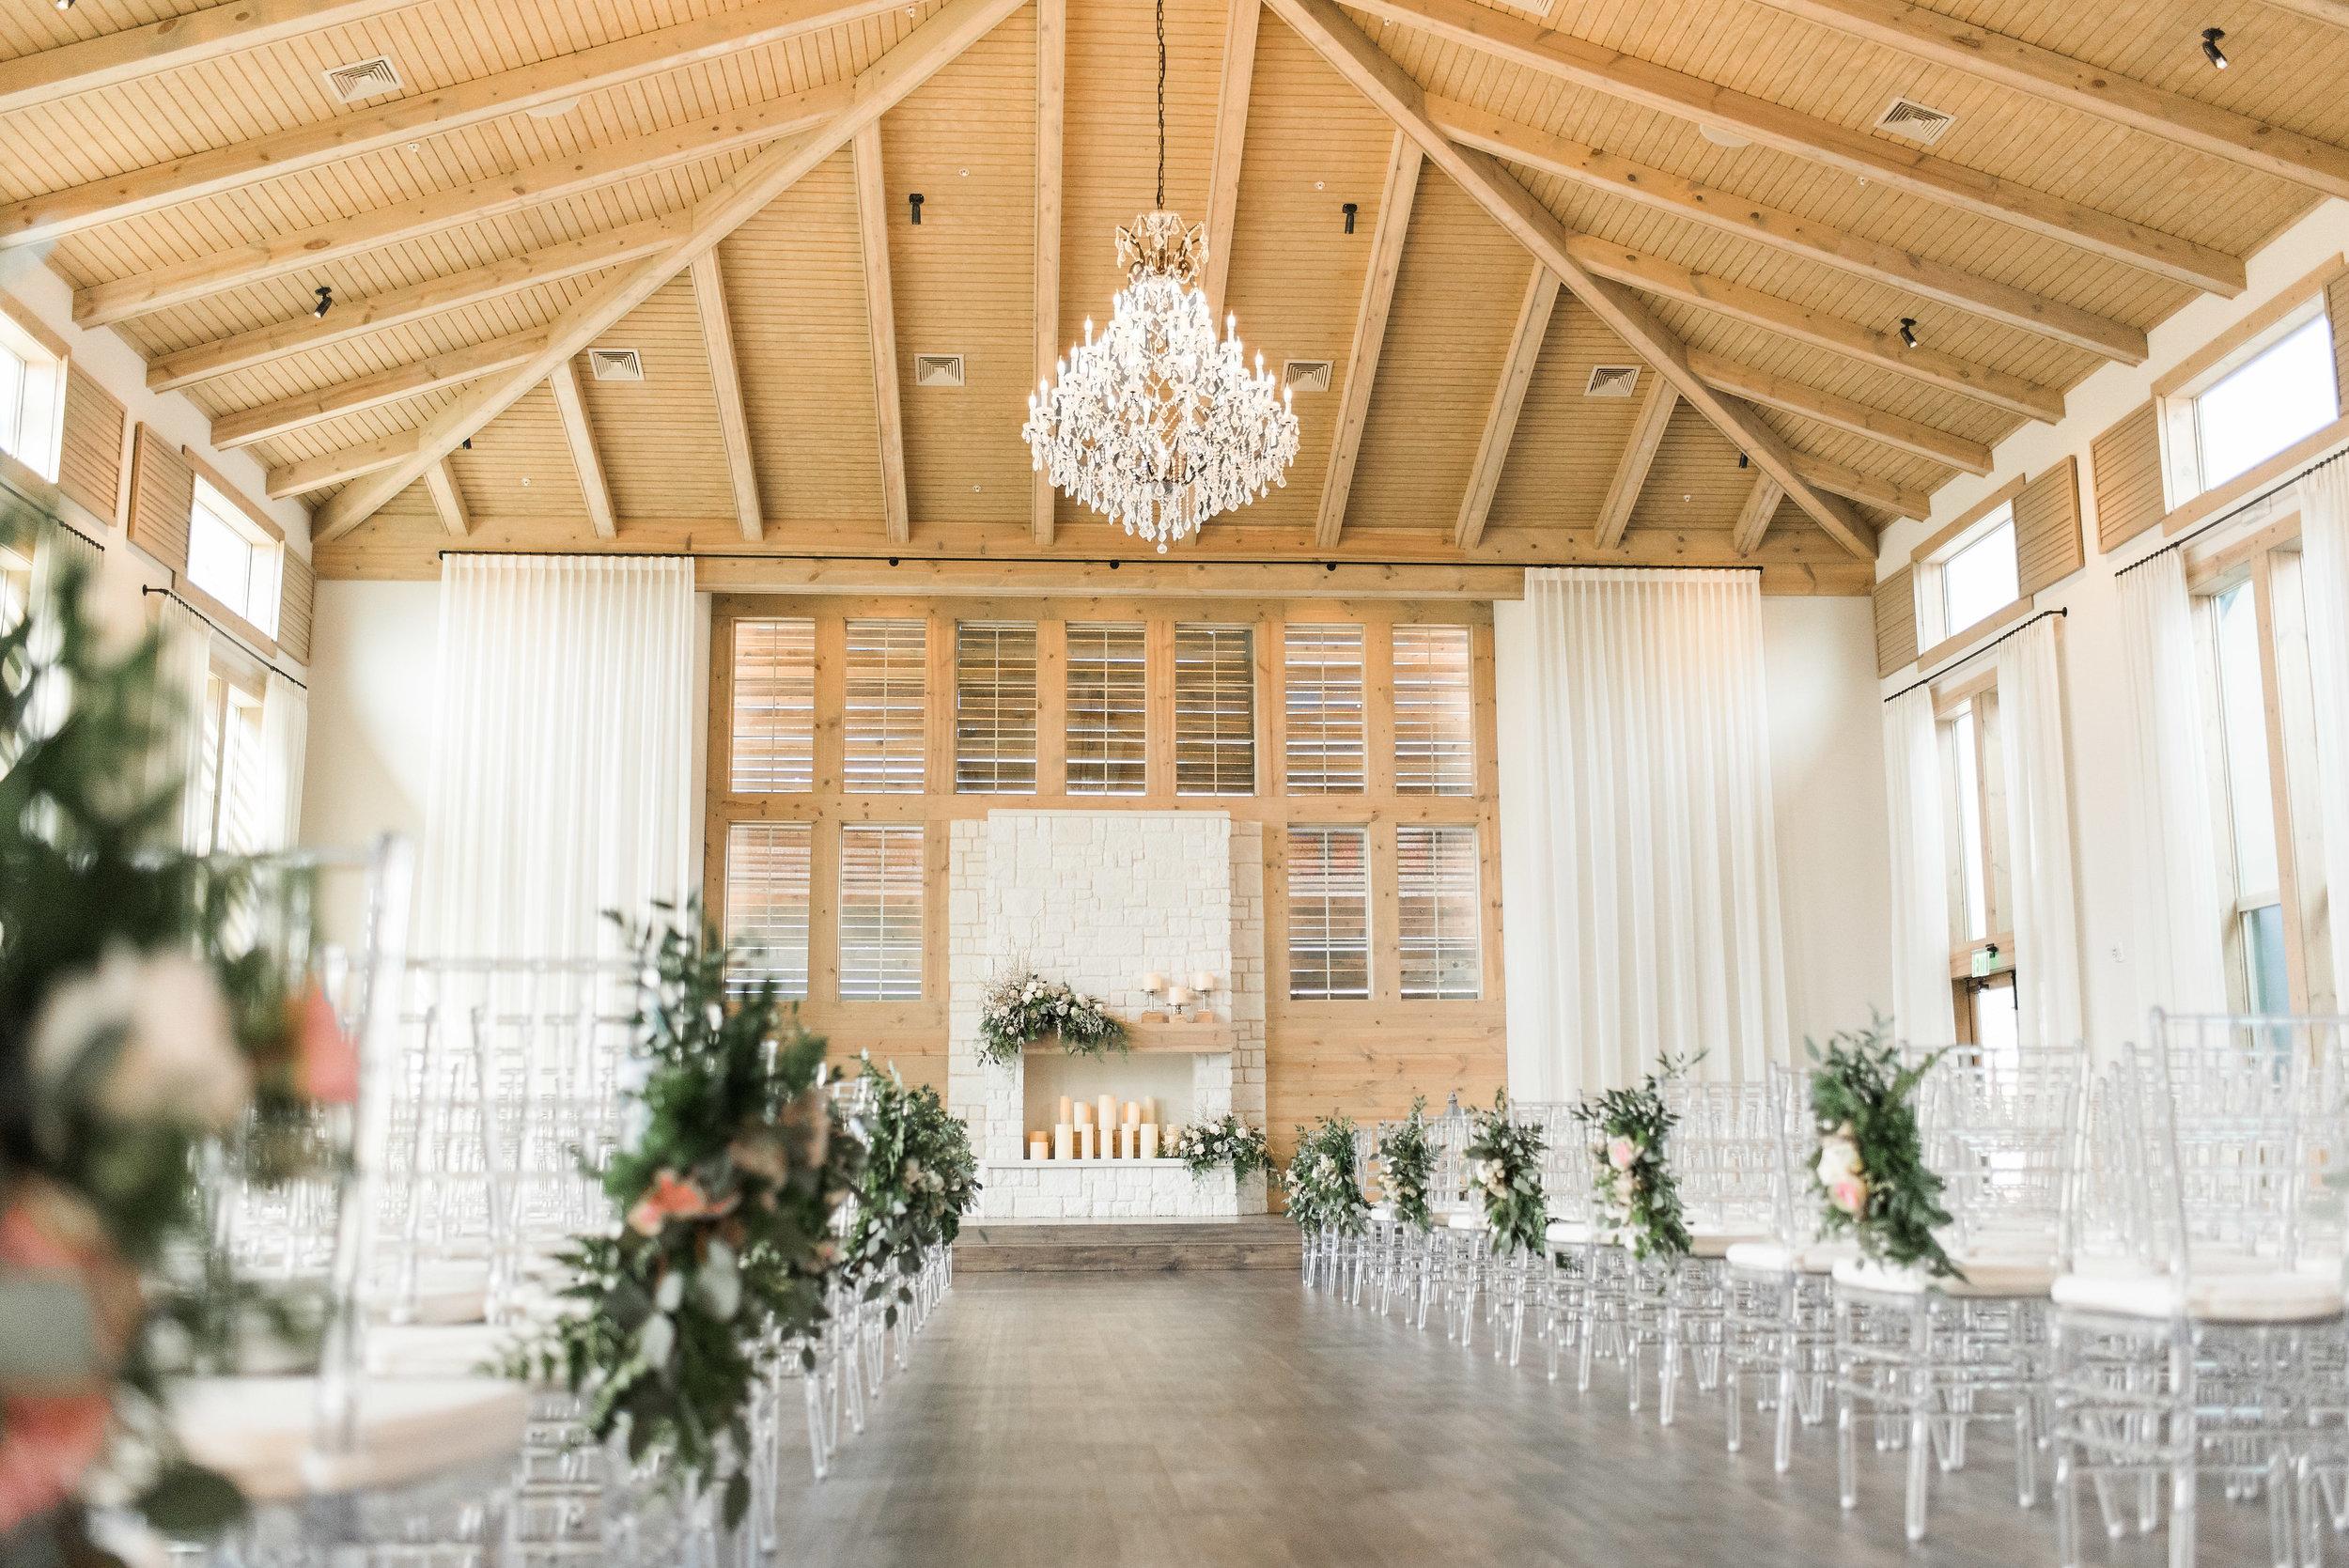 gray-door-photography-wedding-photographer-steph-erffmeyer-dallas-destination21.jpg